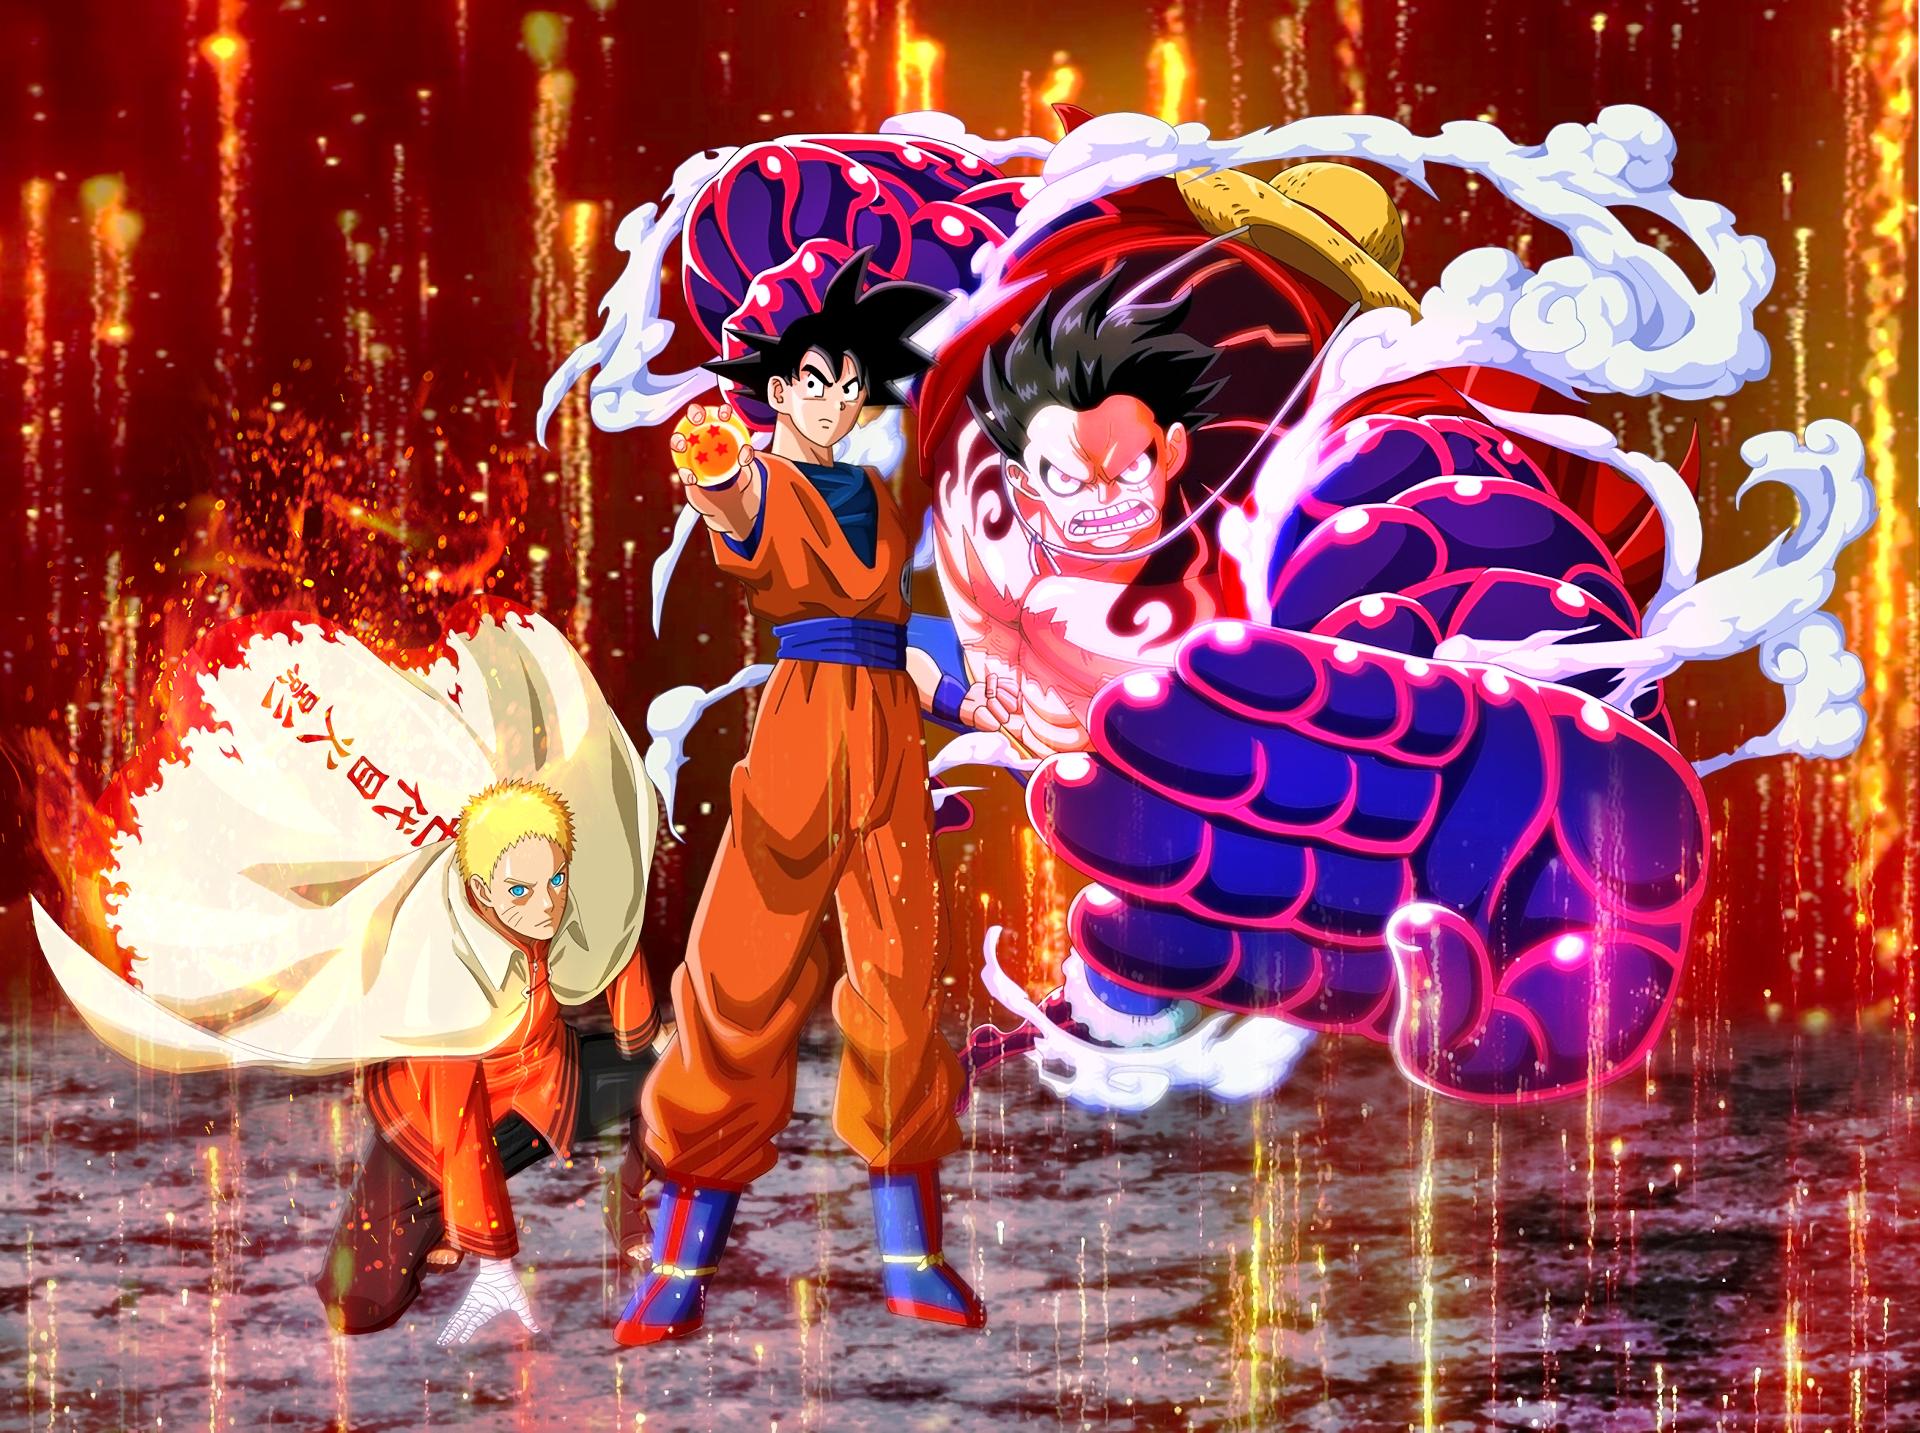 Anime 1920x1433 crossover Son Goku Monkey D. Luffy Uzumaki Naruto Boruto: Naruto Next Generations One Piece Dragon Ball Jump Force